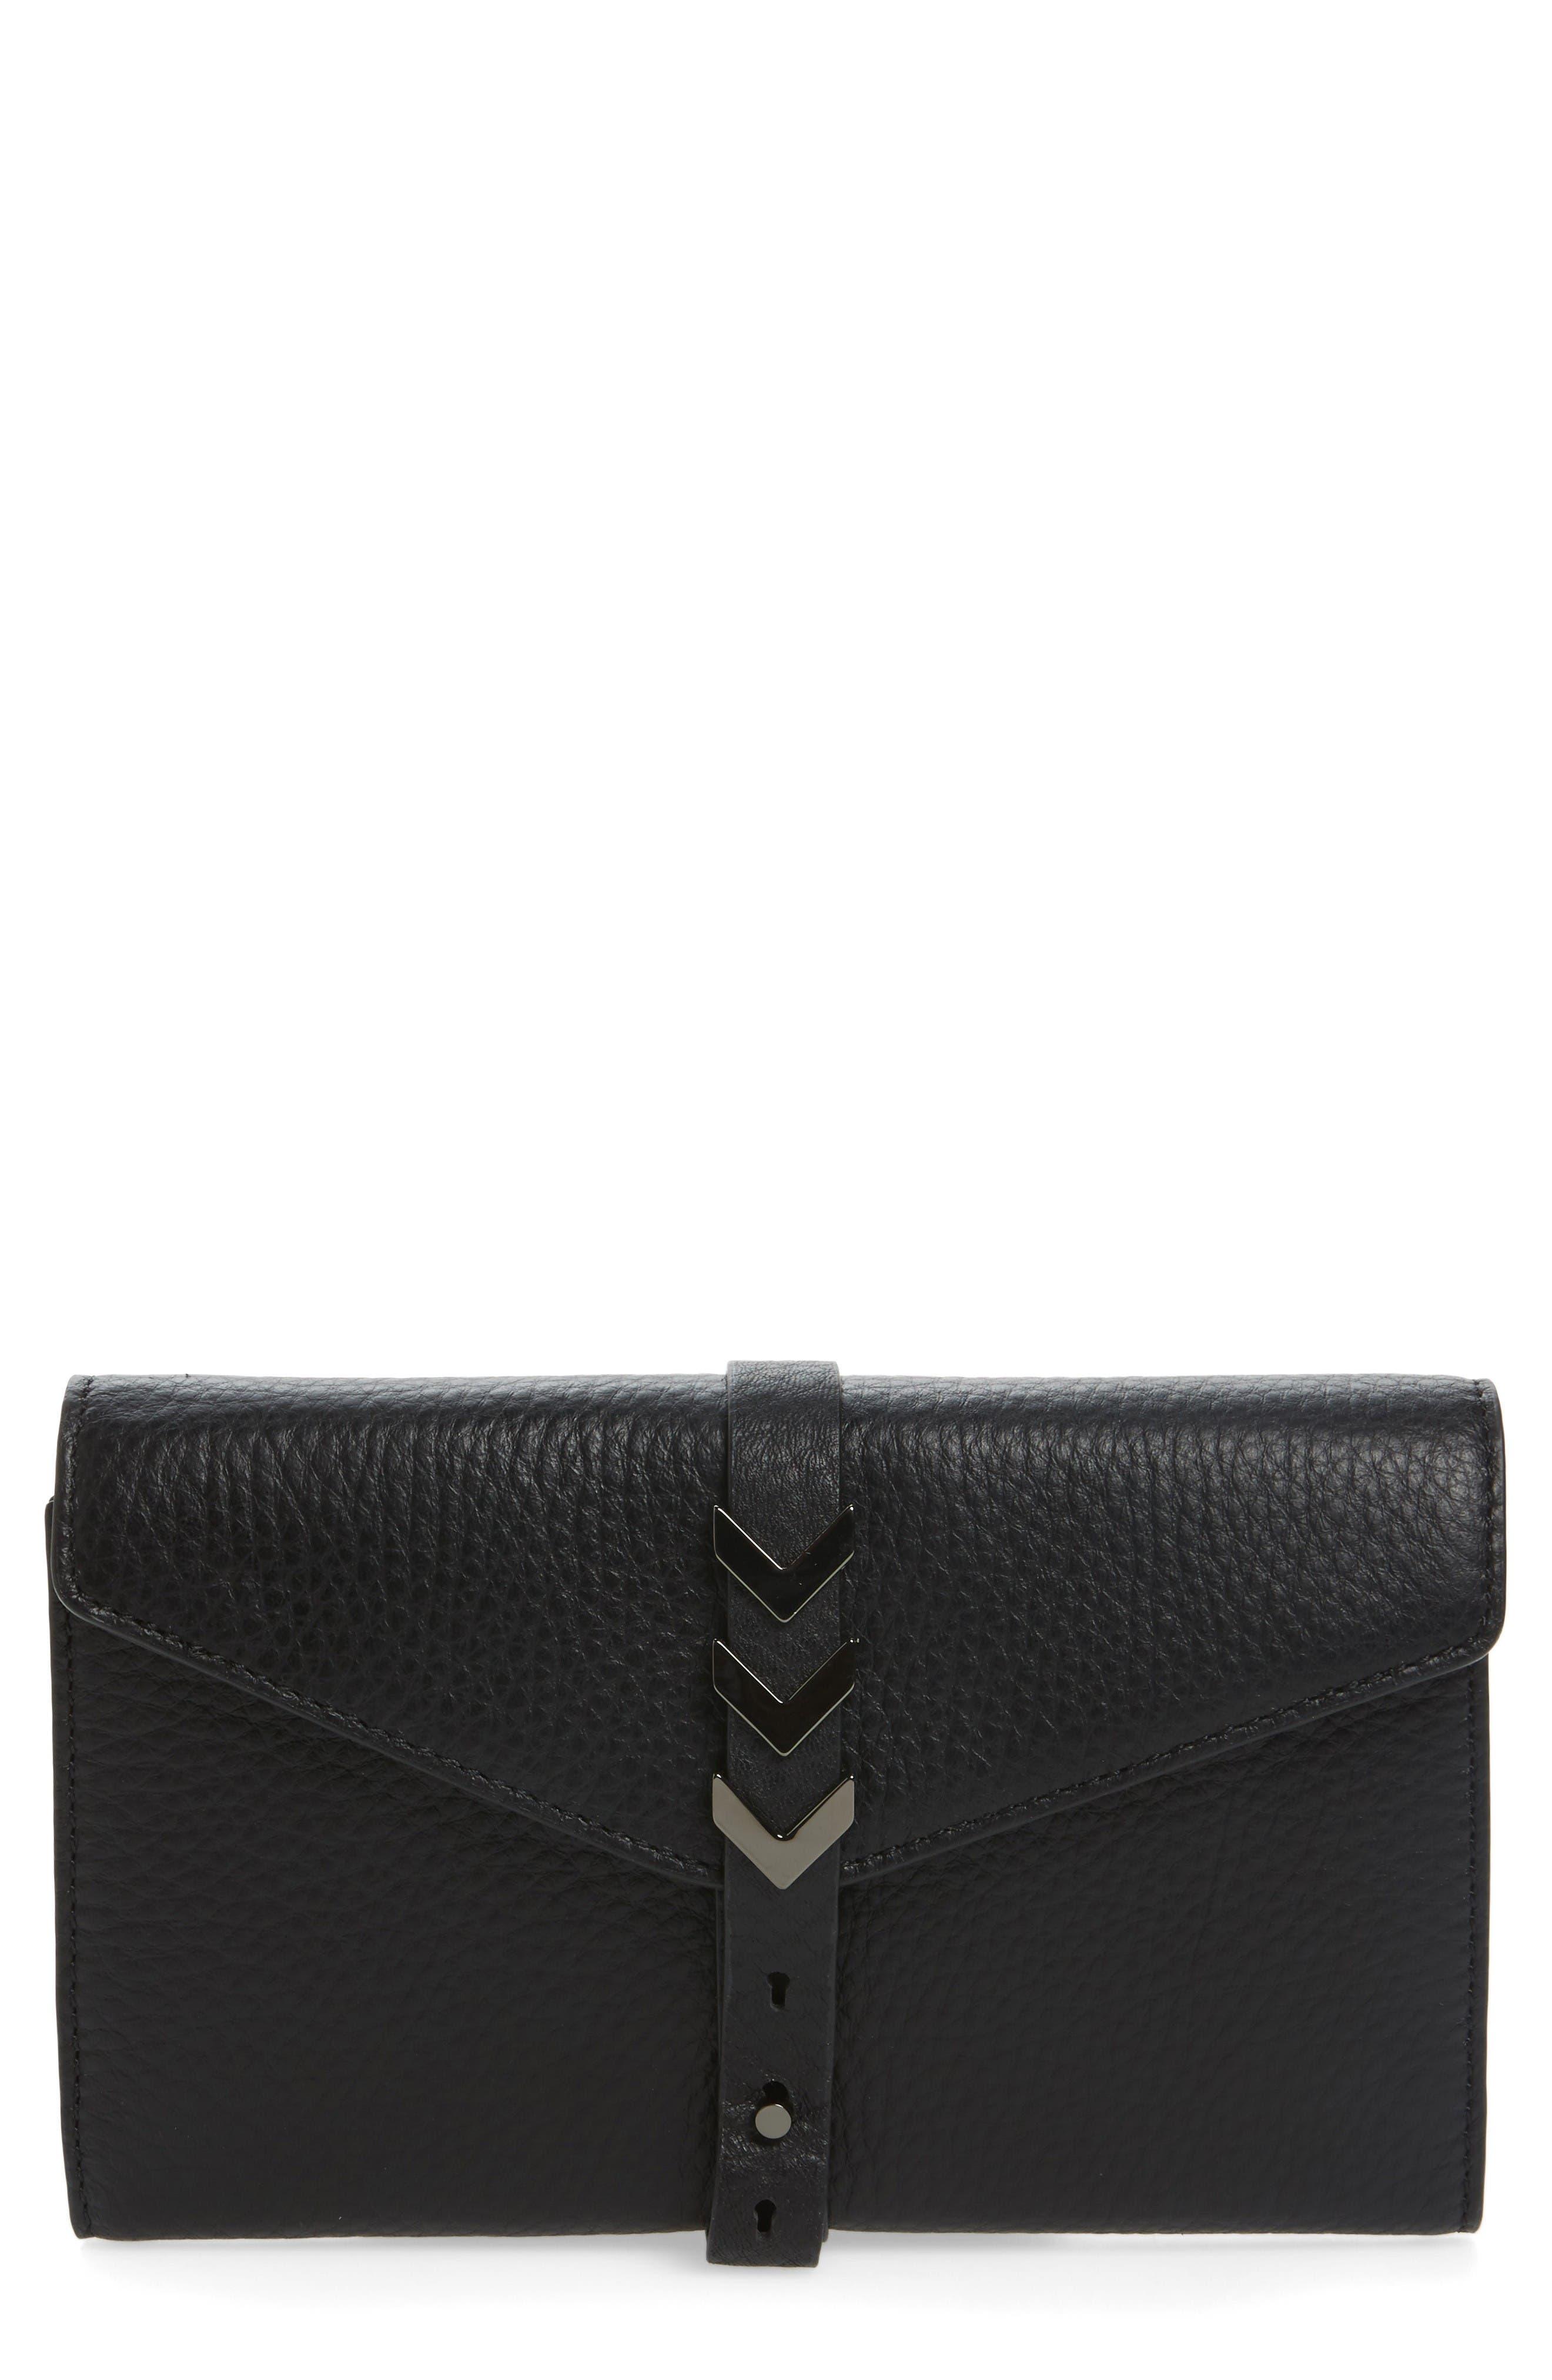 MACKAGE Atlas Leather Envelope Wallet